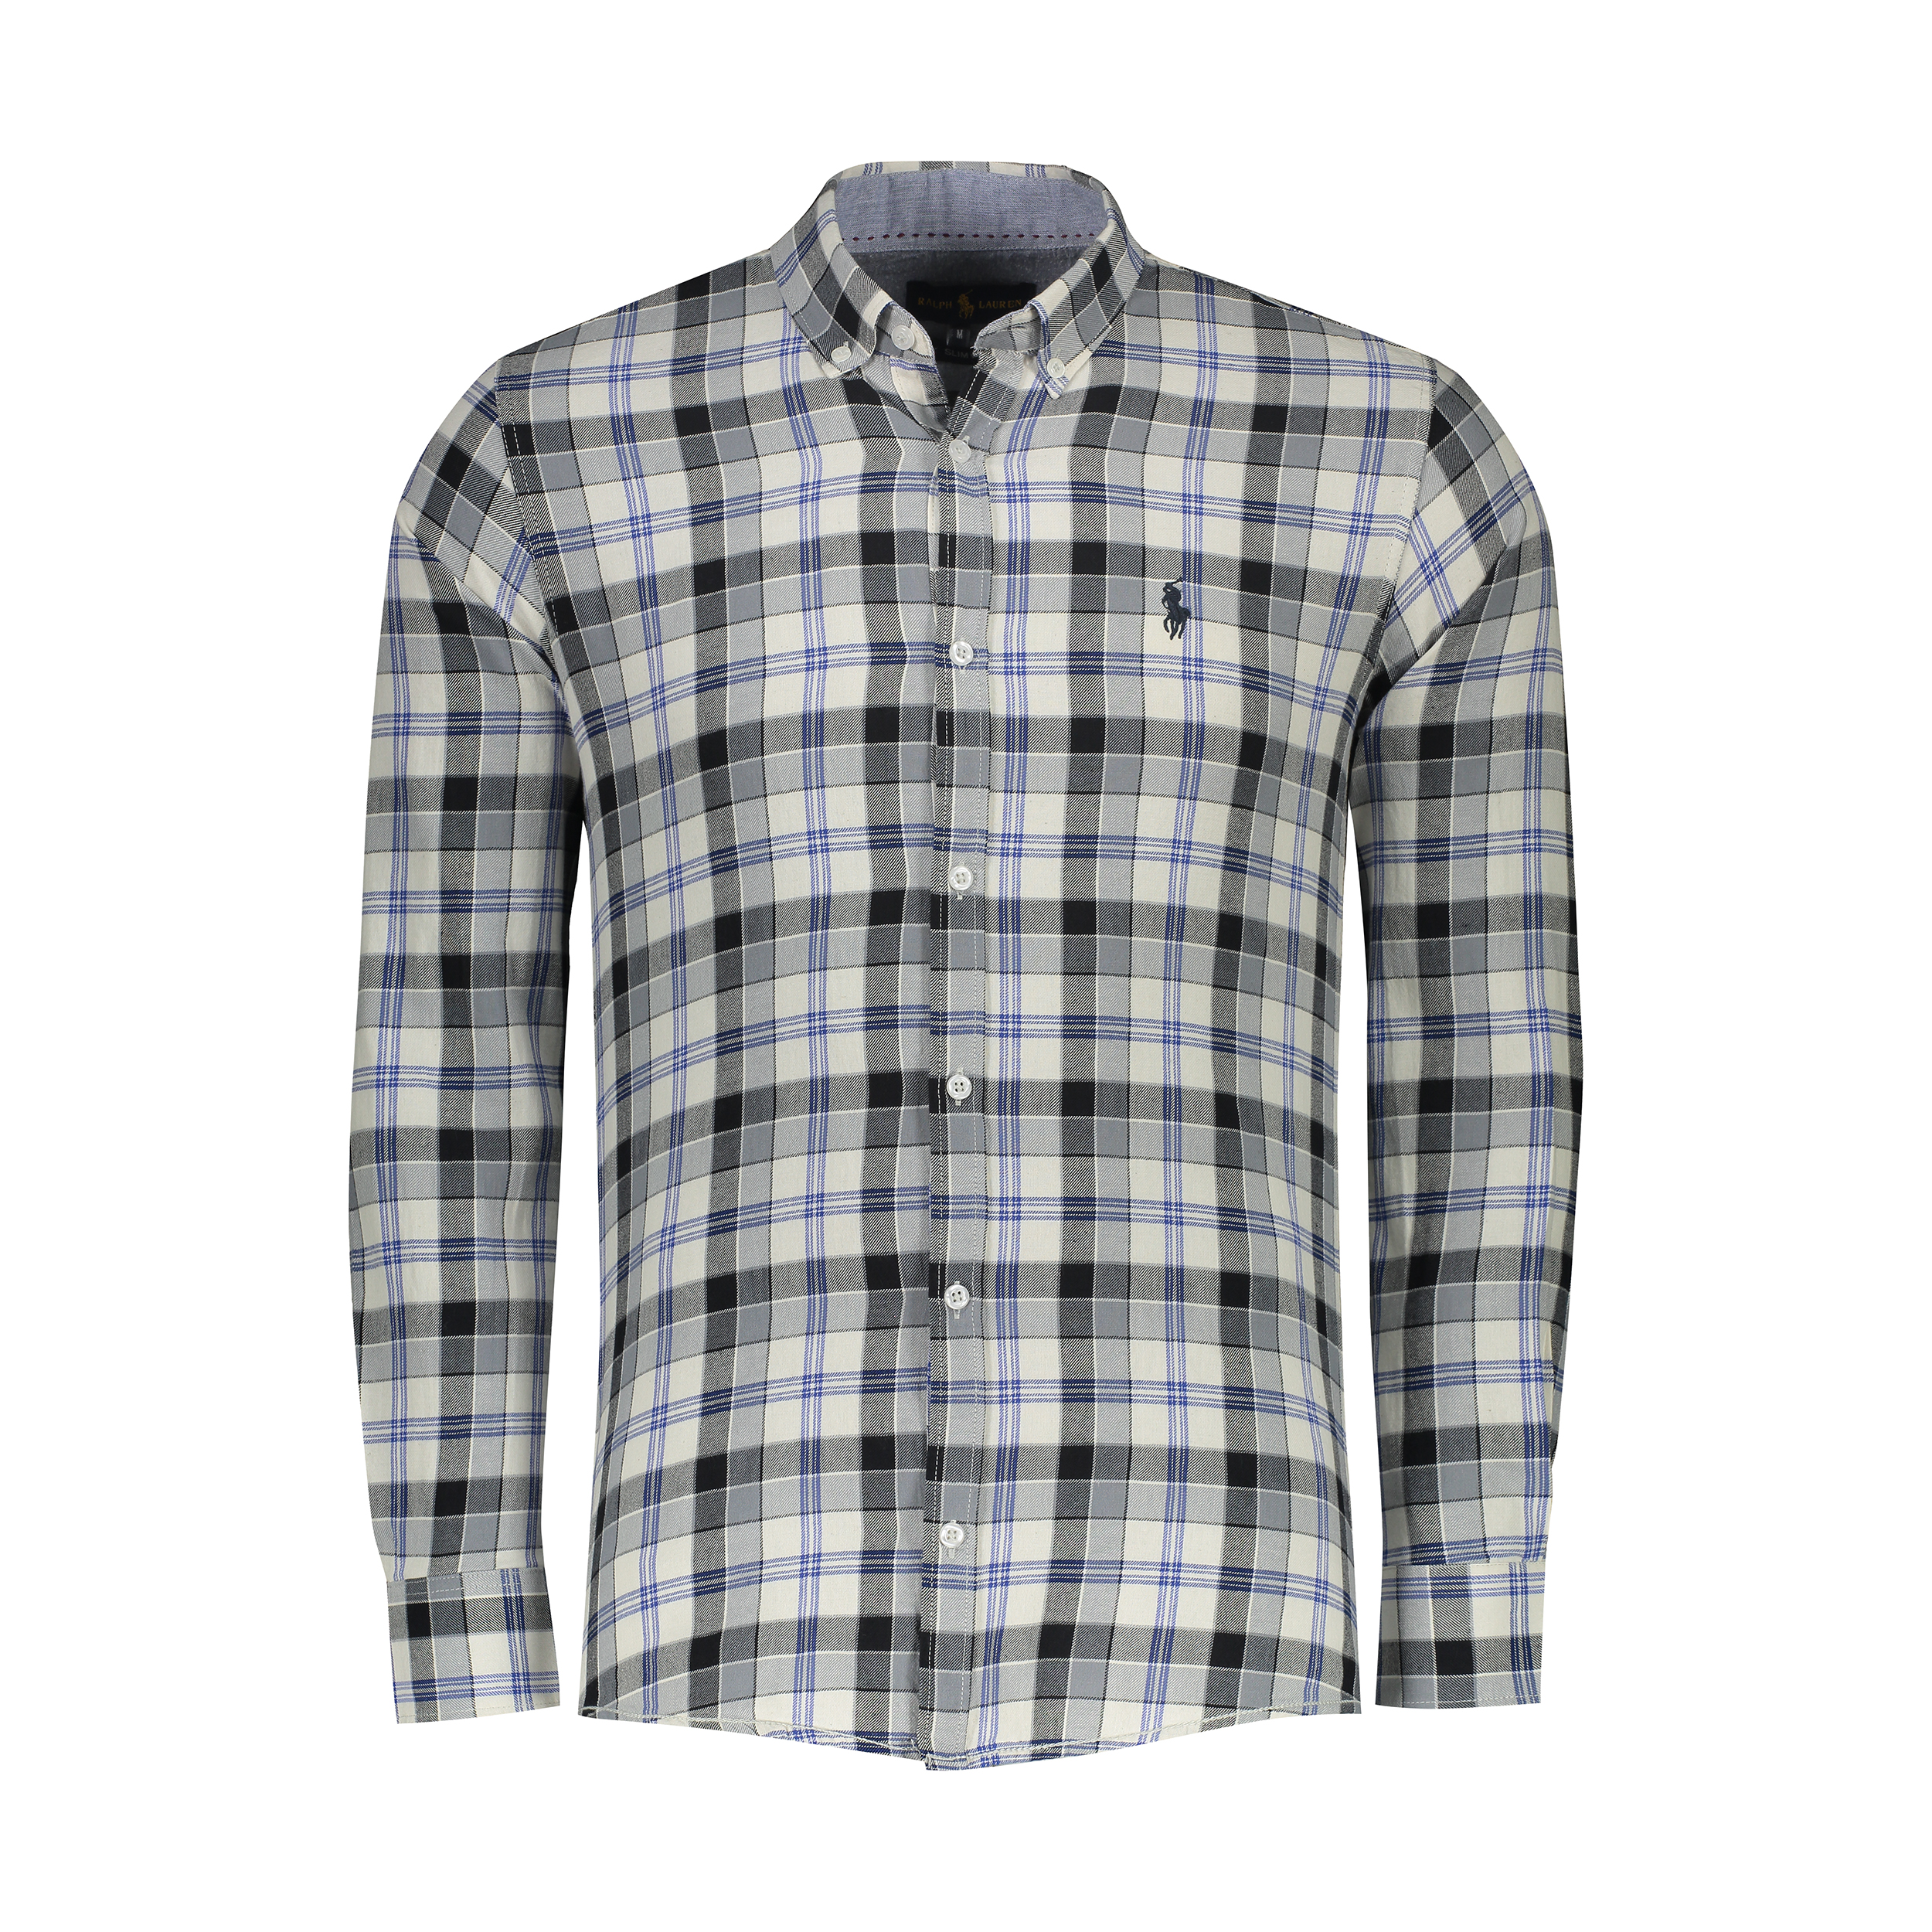 پیراهن آستین بلند مردانه پولو مدل A449